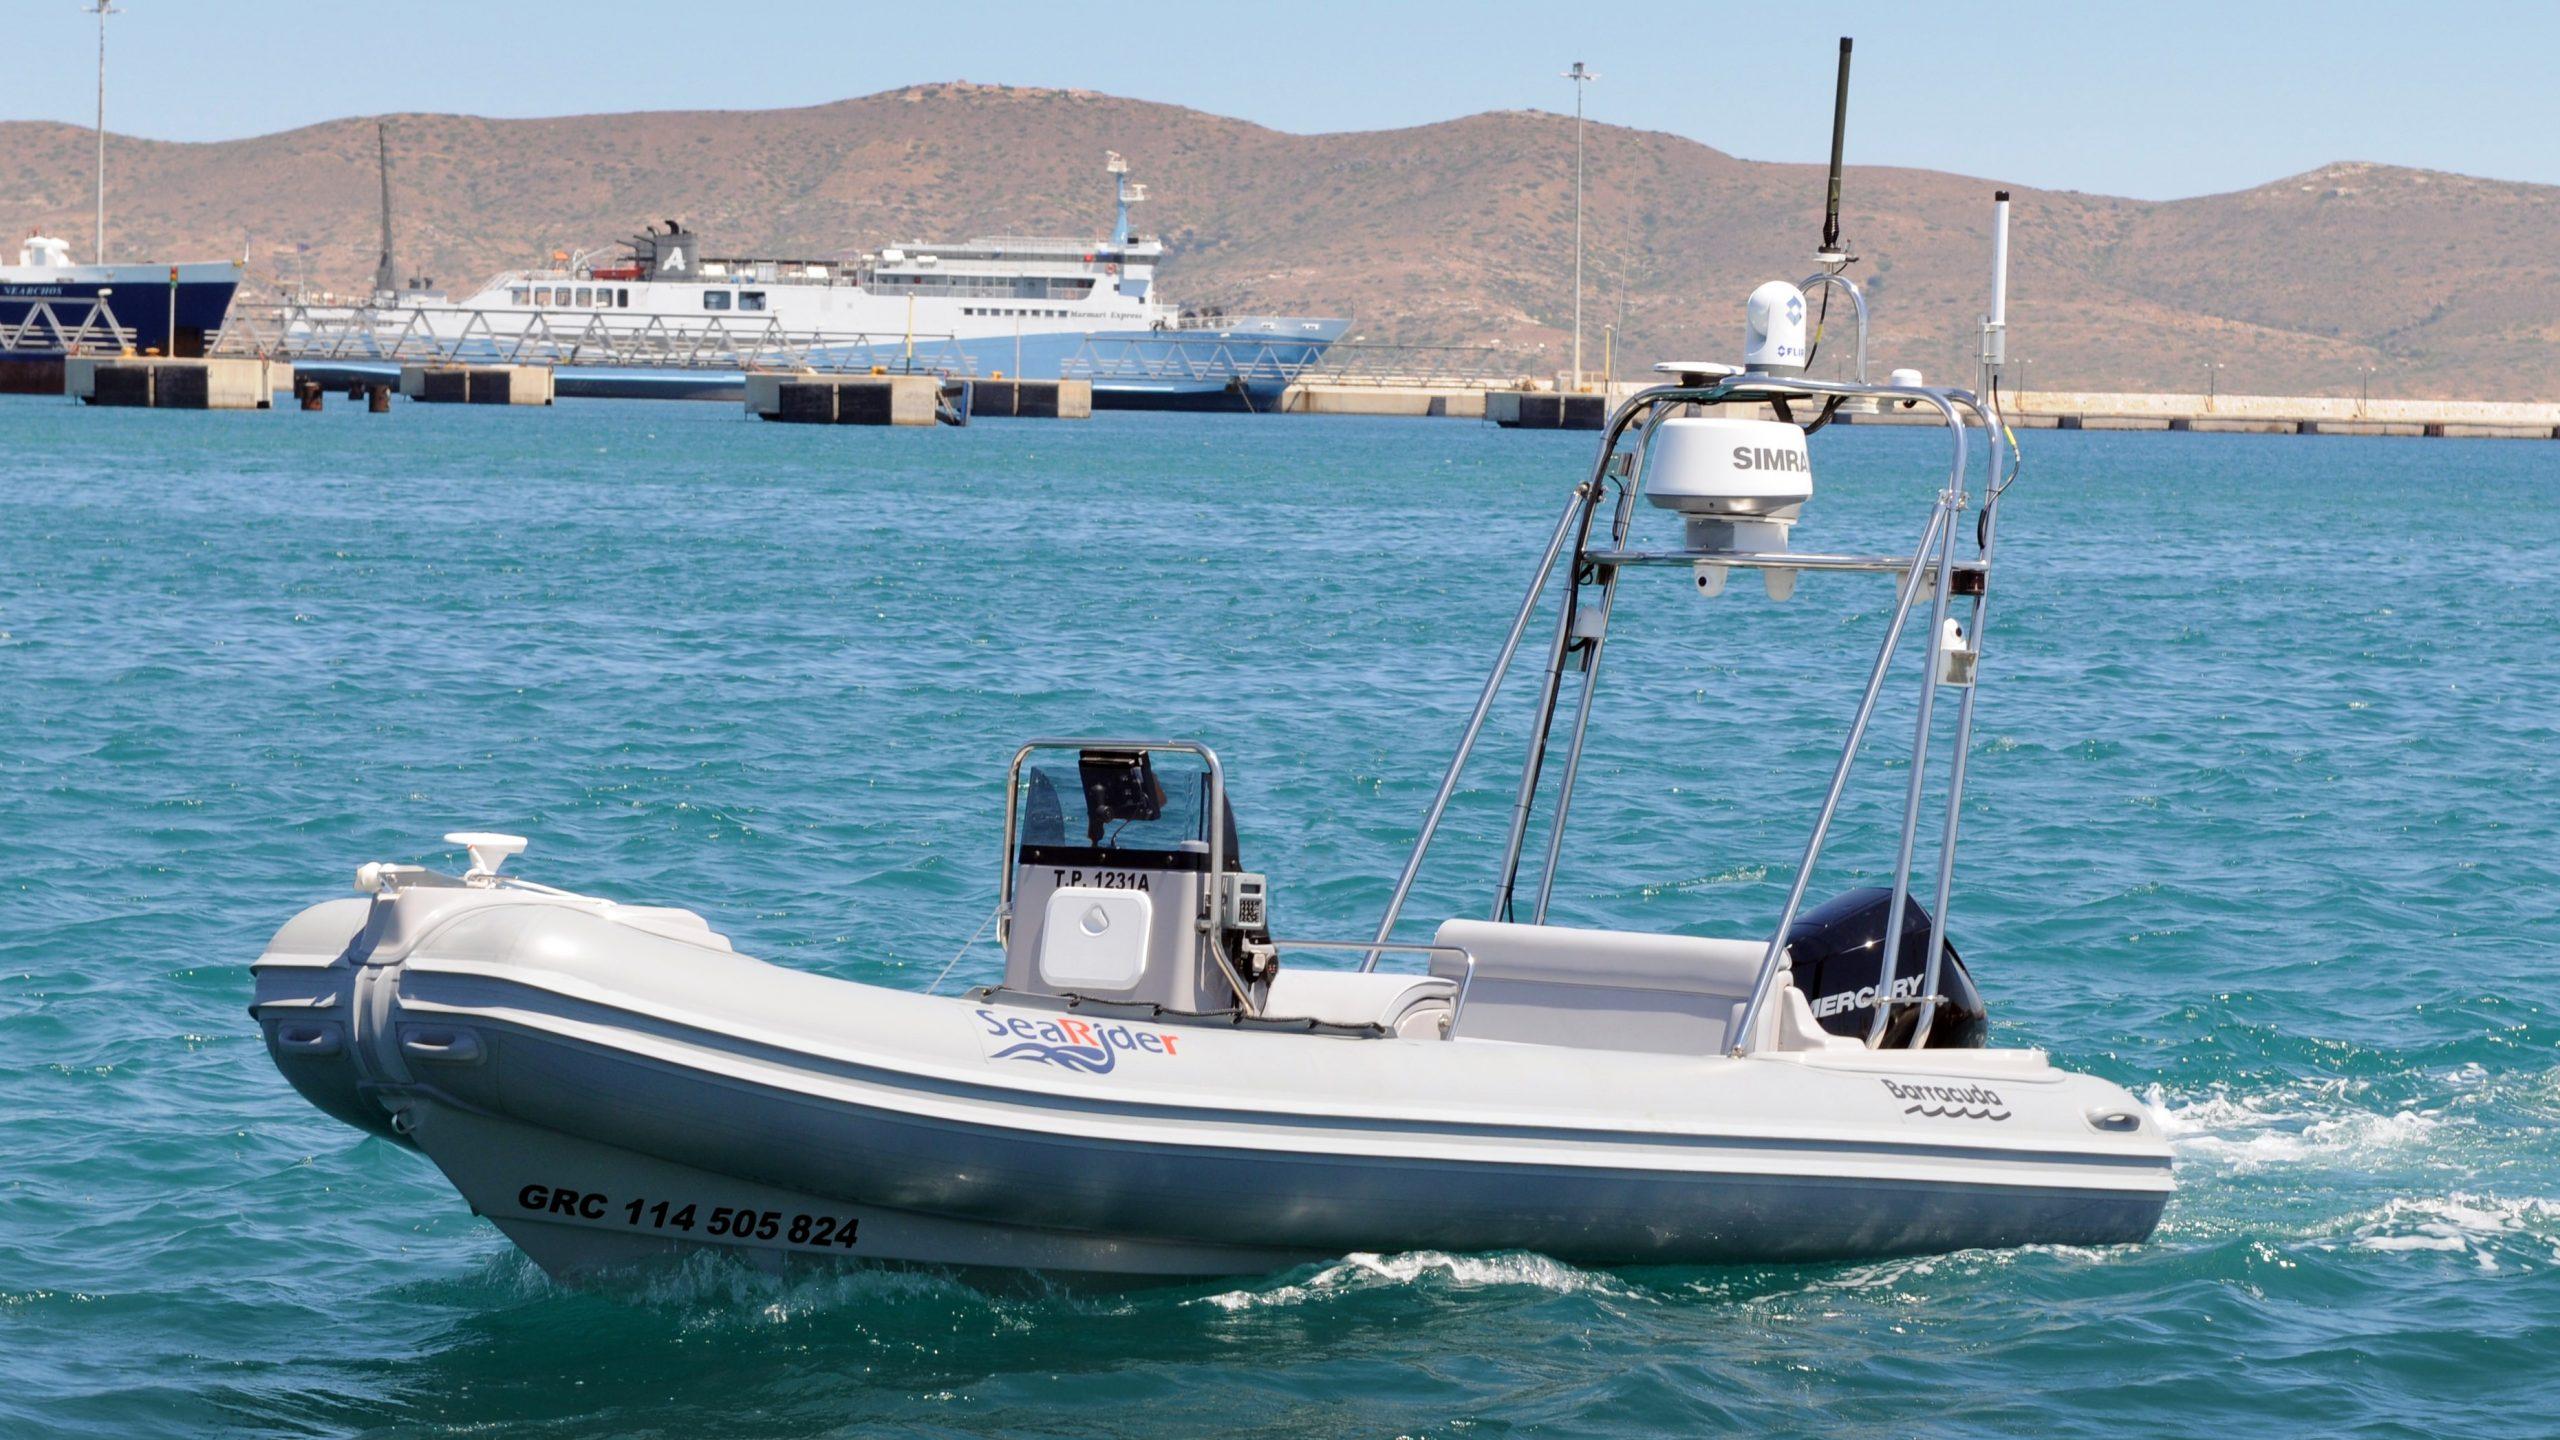 Photo of Τι είναι το OCEAN2020 και η ελληνική προσπάθεια με το USV SeaRider που παρουσίασε η INTRACOM Defense